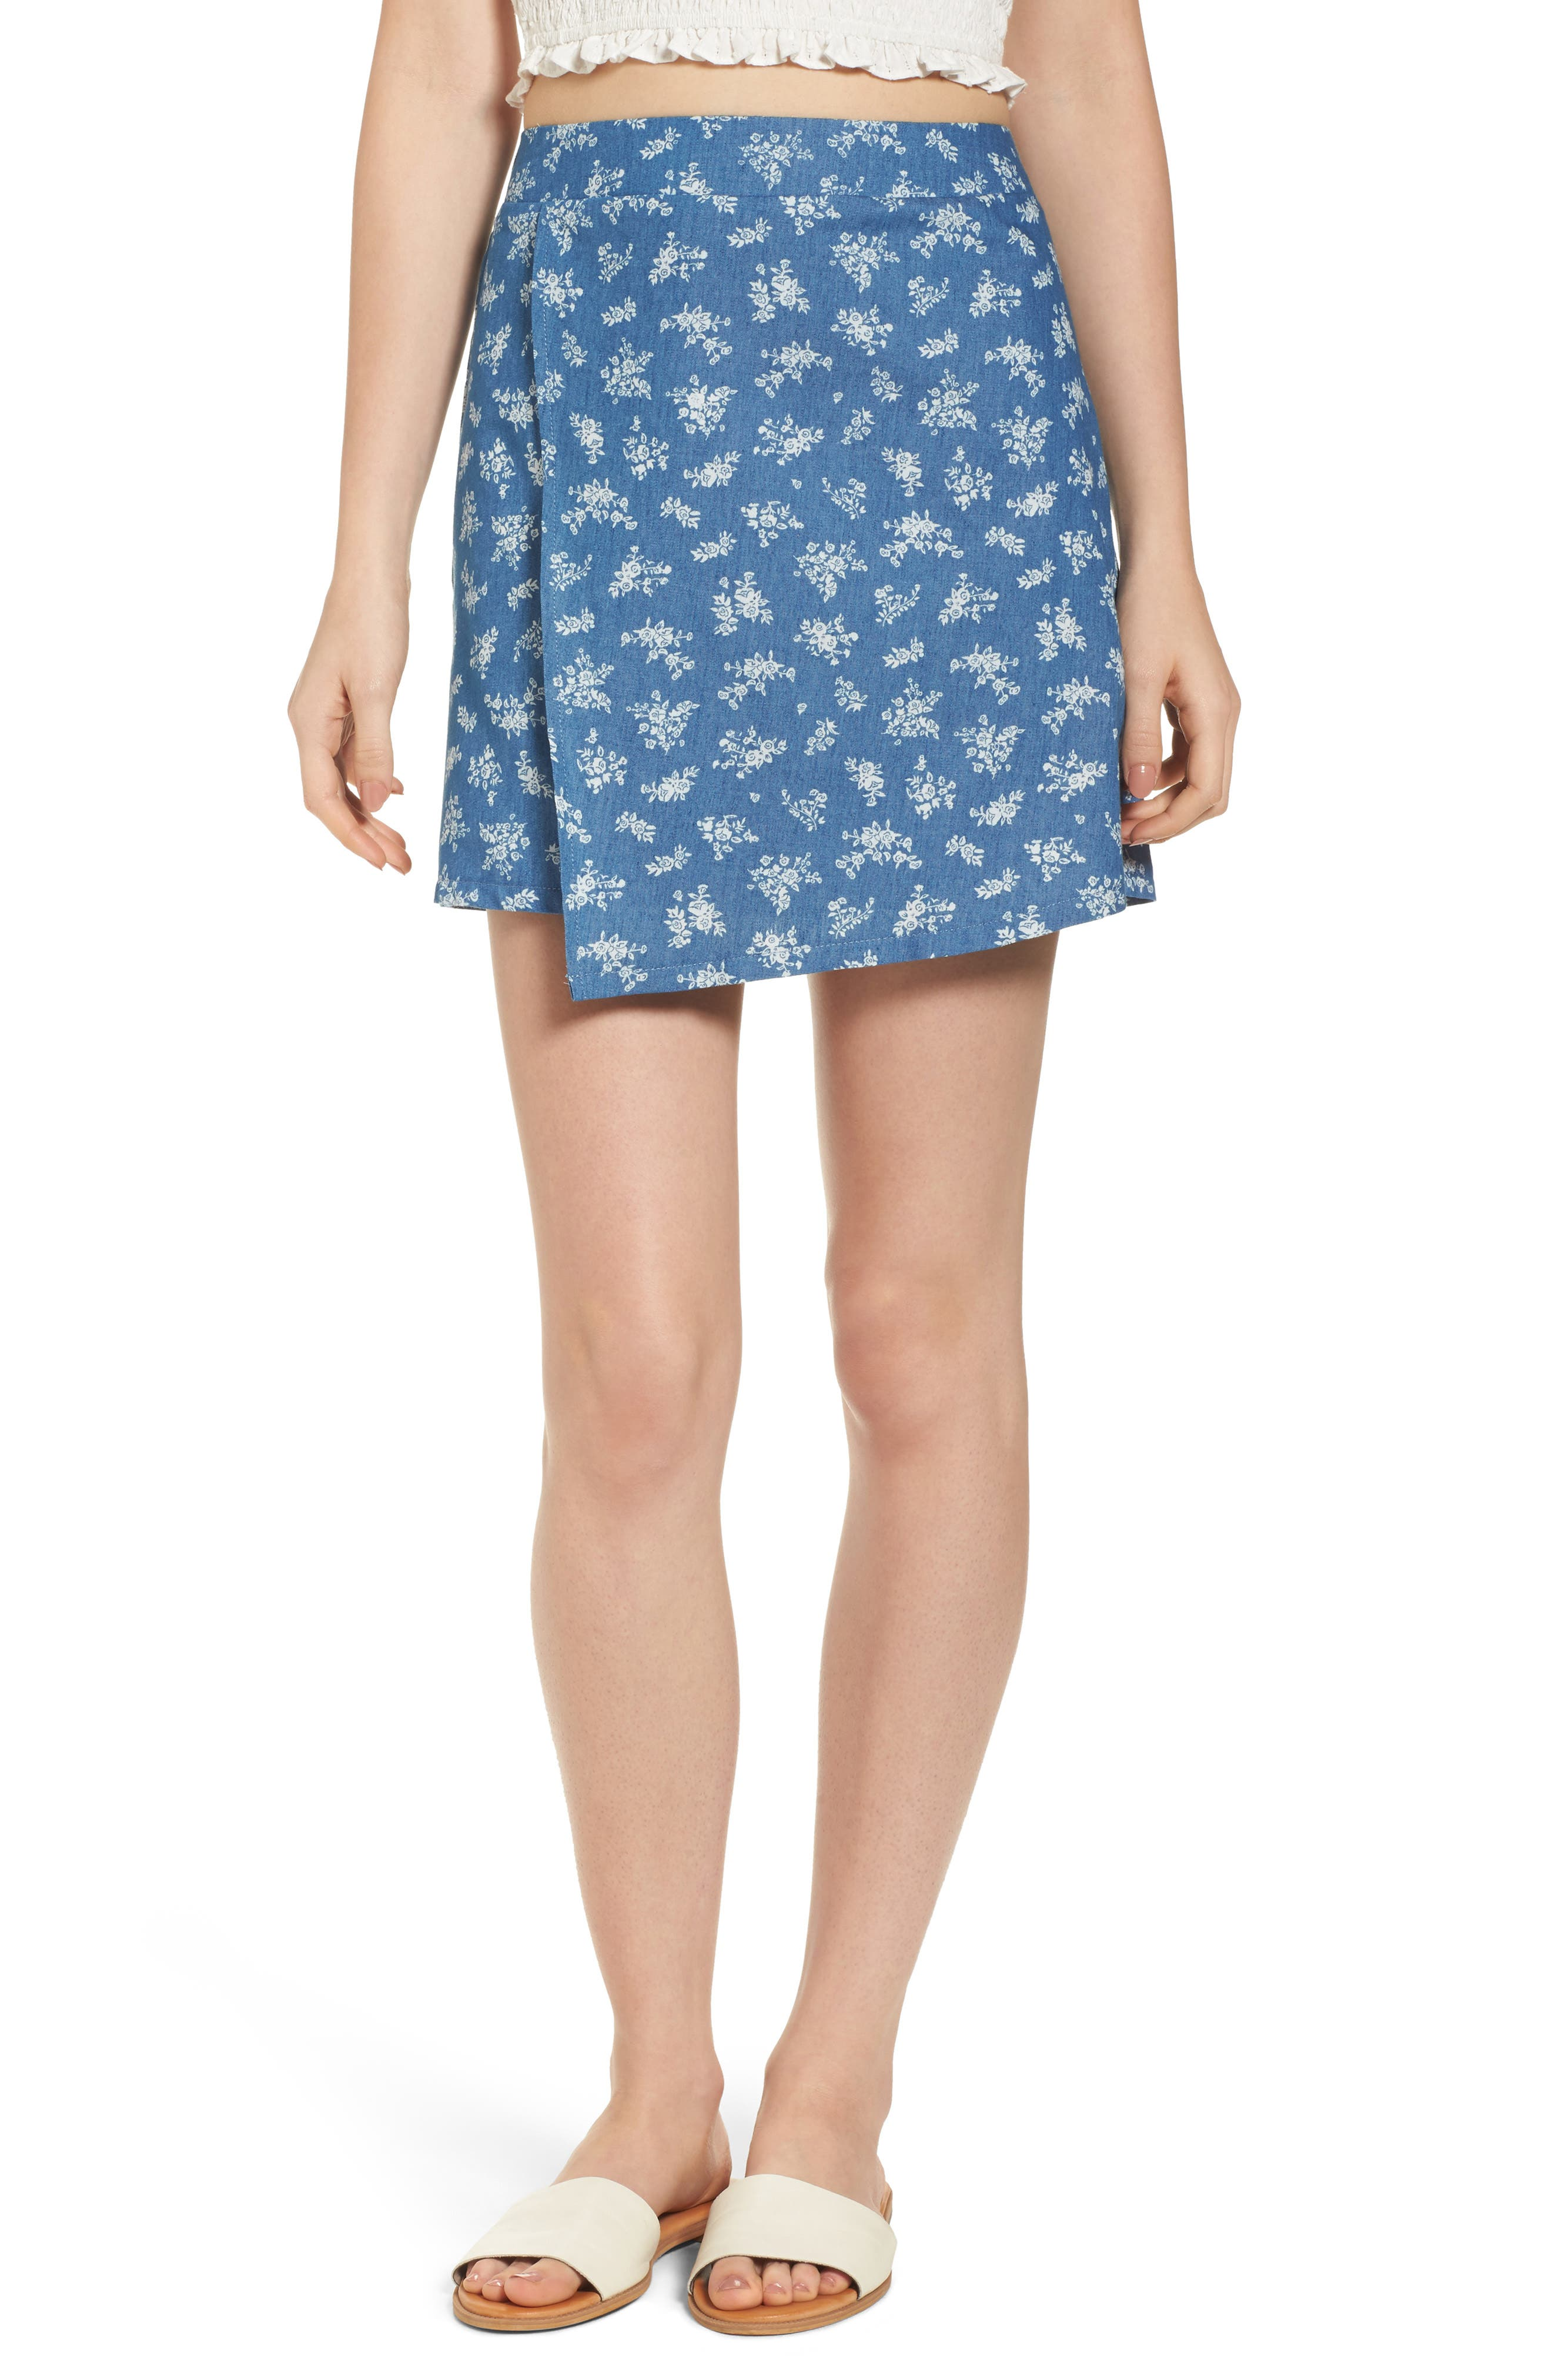 Mimi Chica Floral Print Wrap Panel Denim Skirt